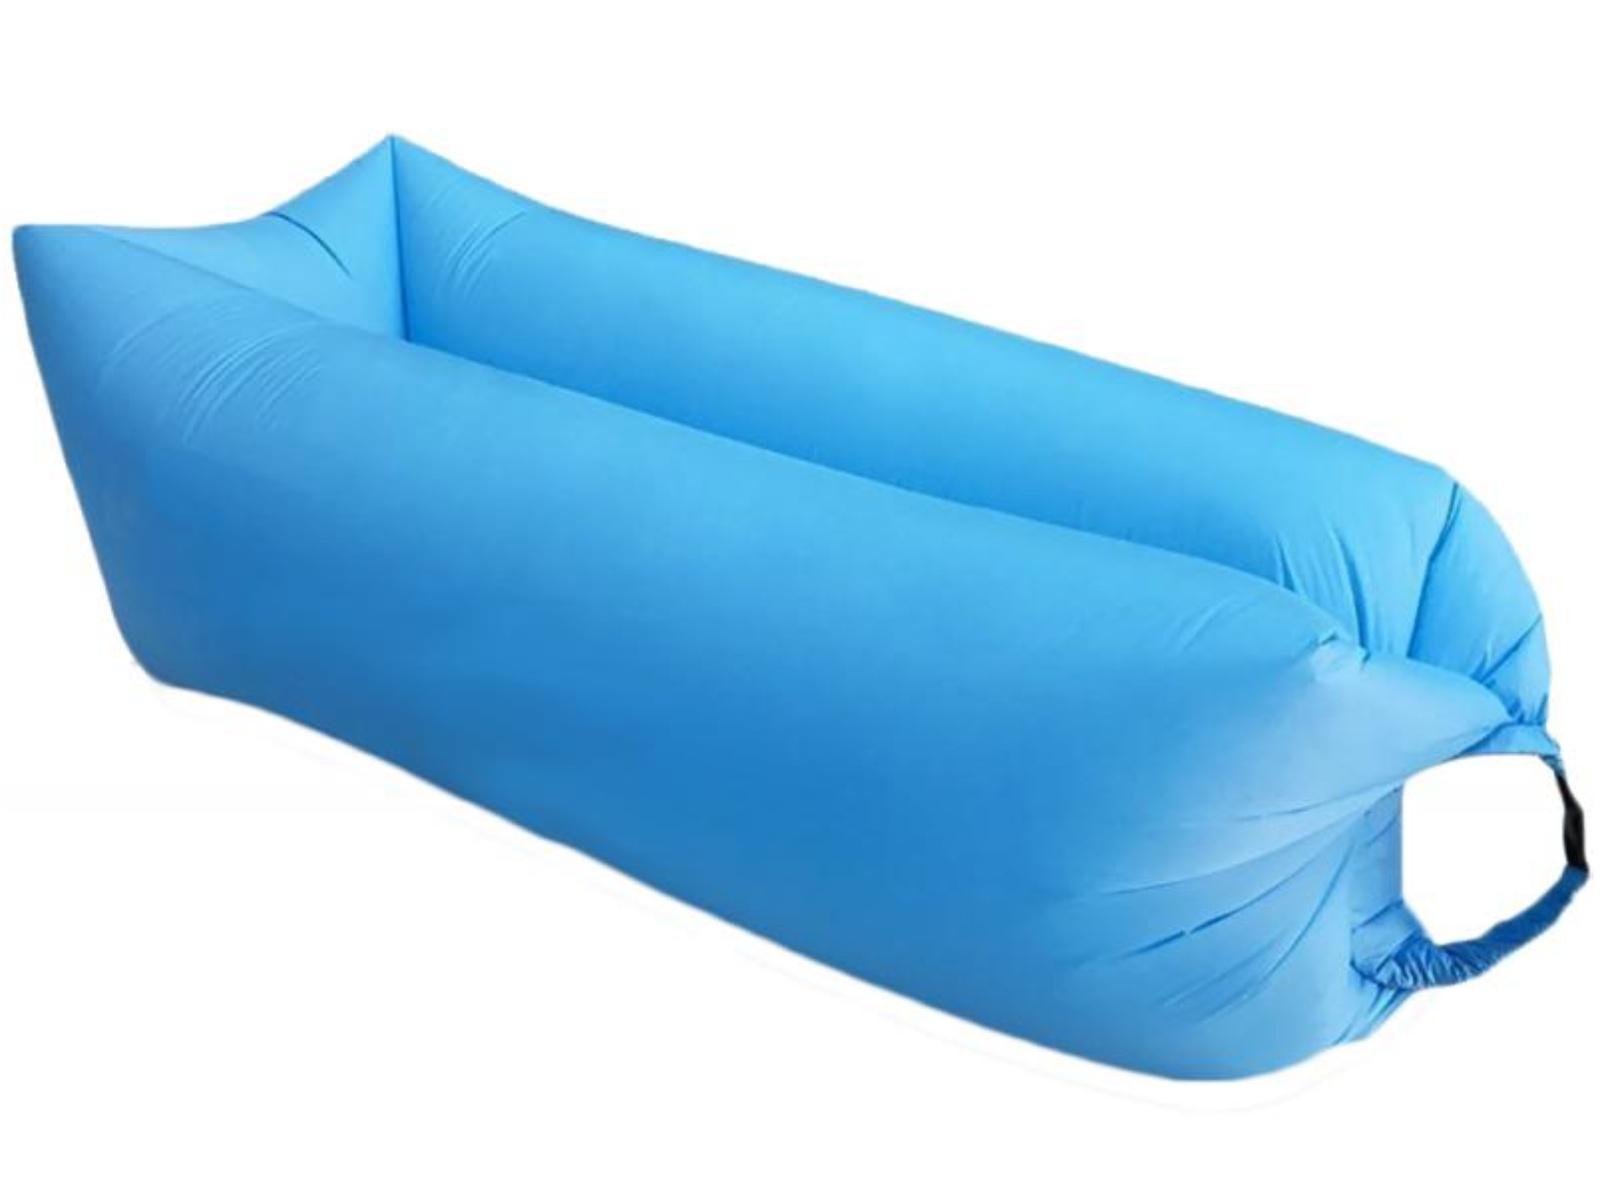 Nafukovací vak SEDCO Sofair Pillow Shape - svetlo modrý